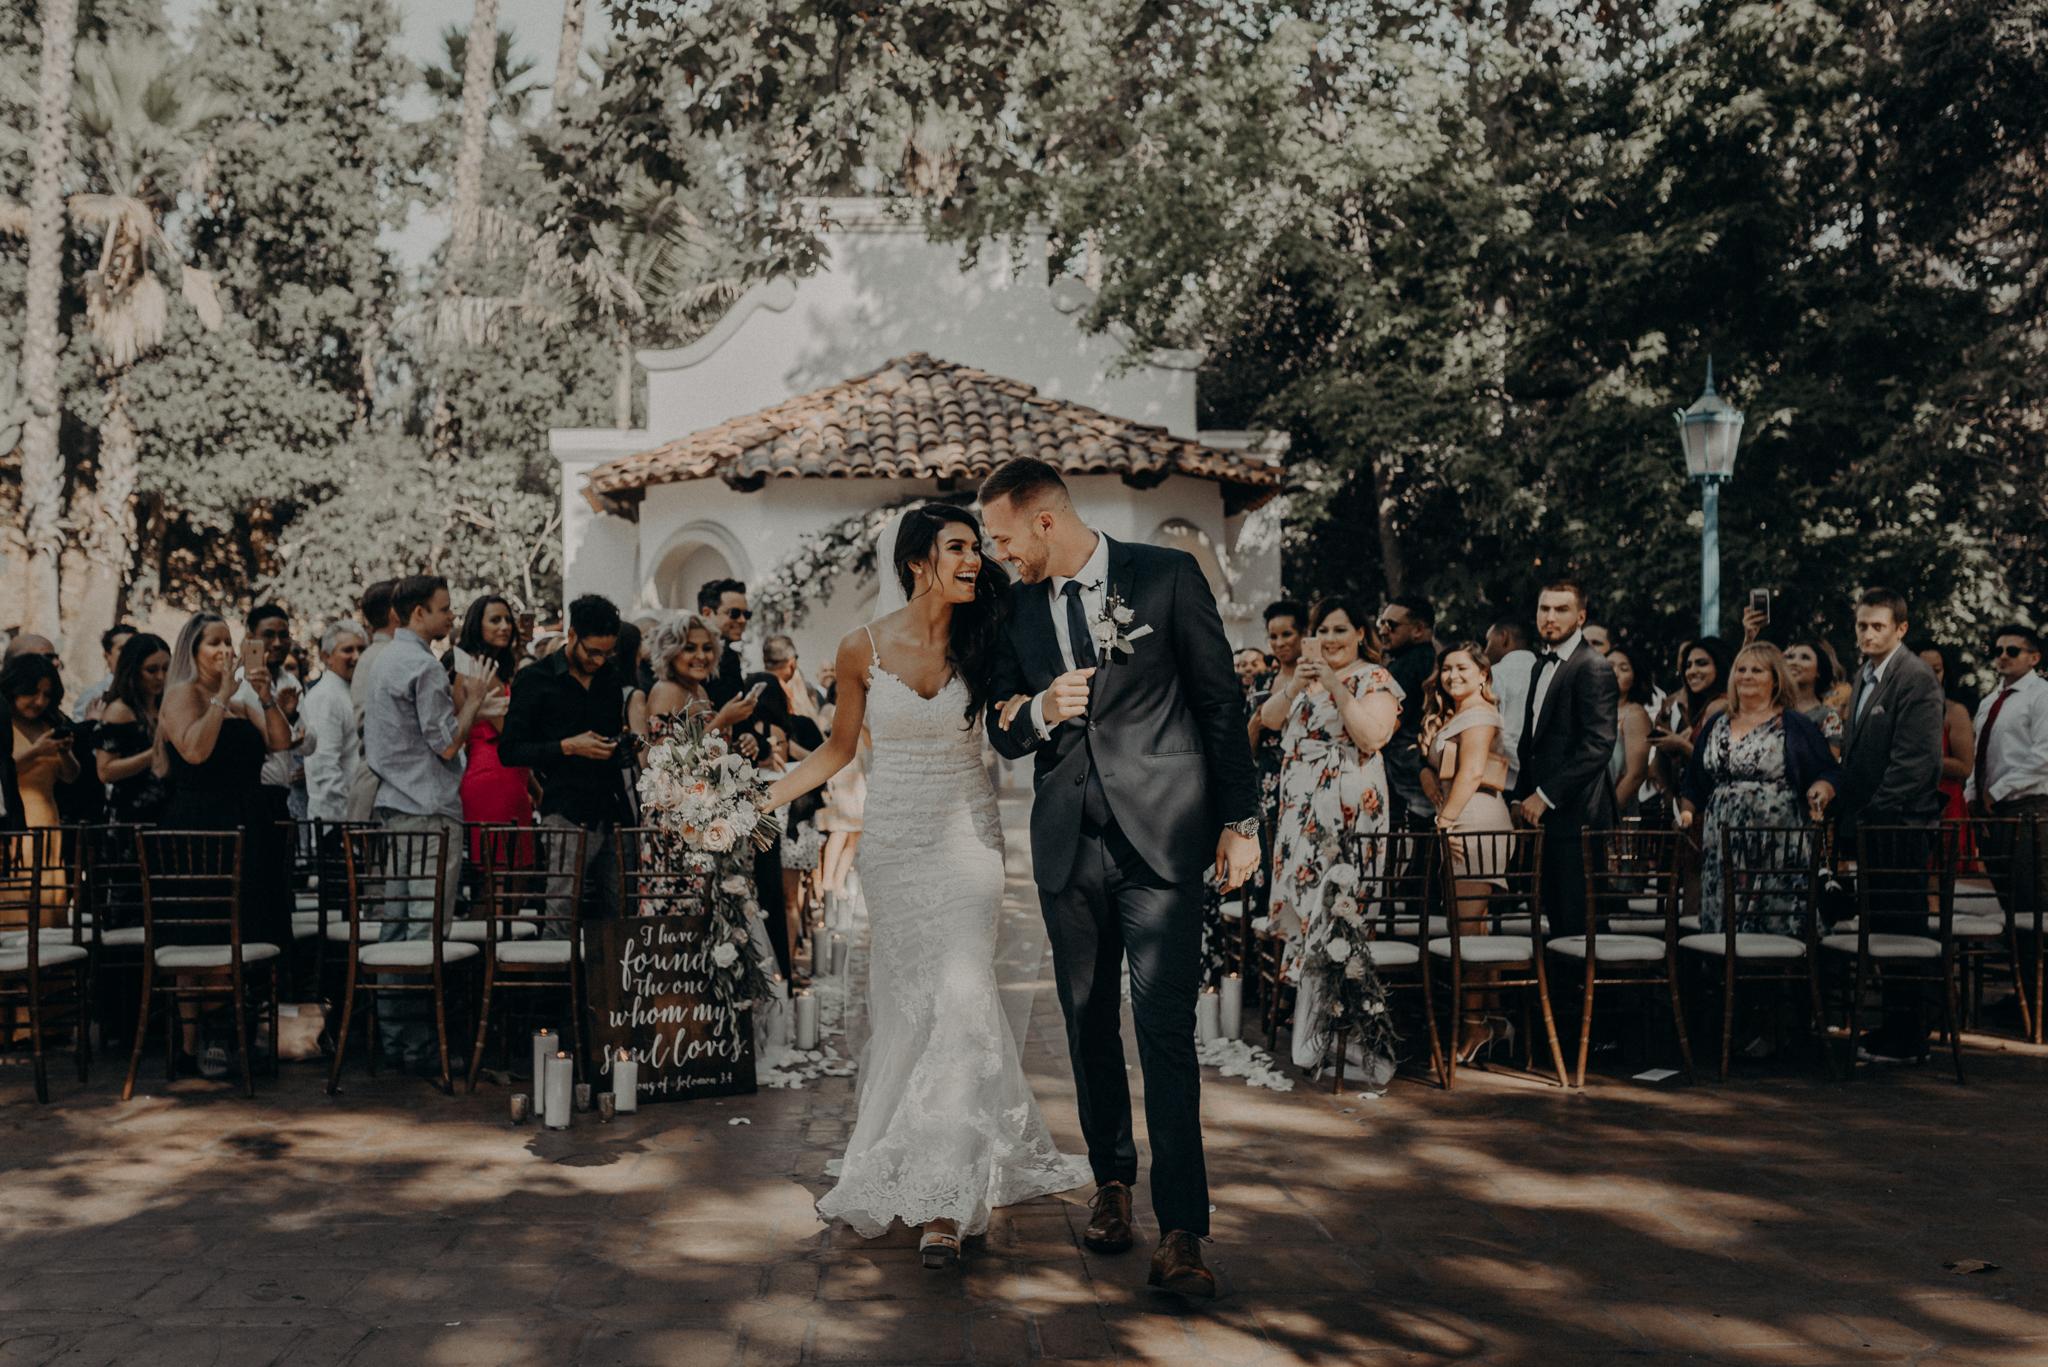 Isaiah + Taylor Photography - Rancho Las Lomas Wedding, Los Angeles Wedding Photographer-067.jpg